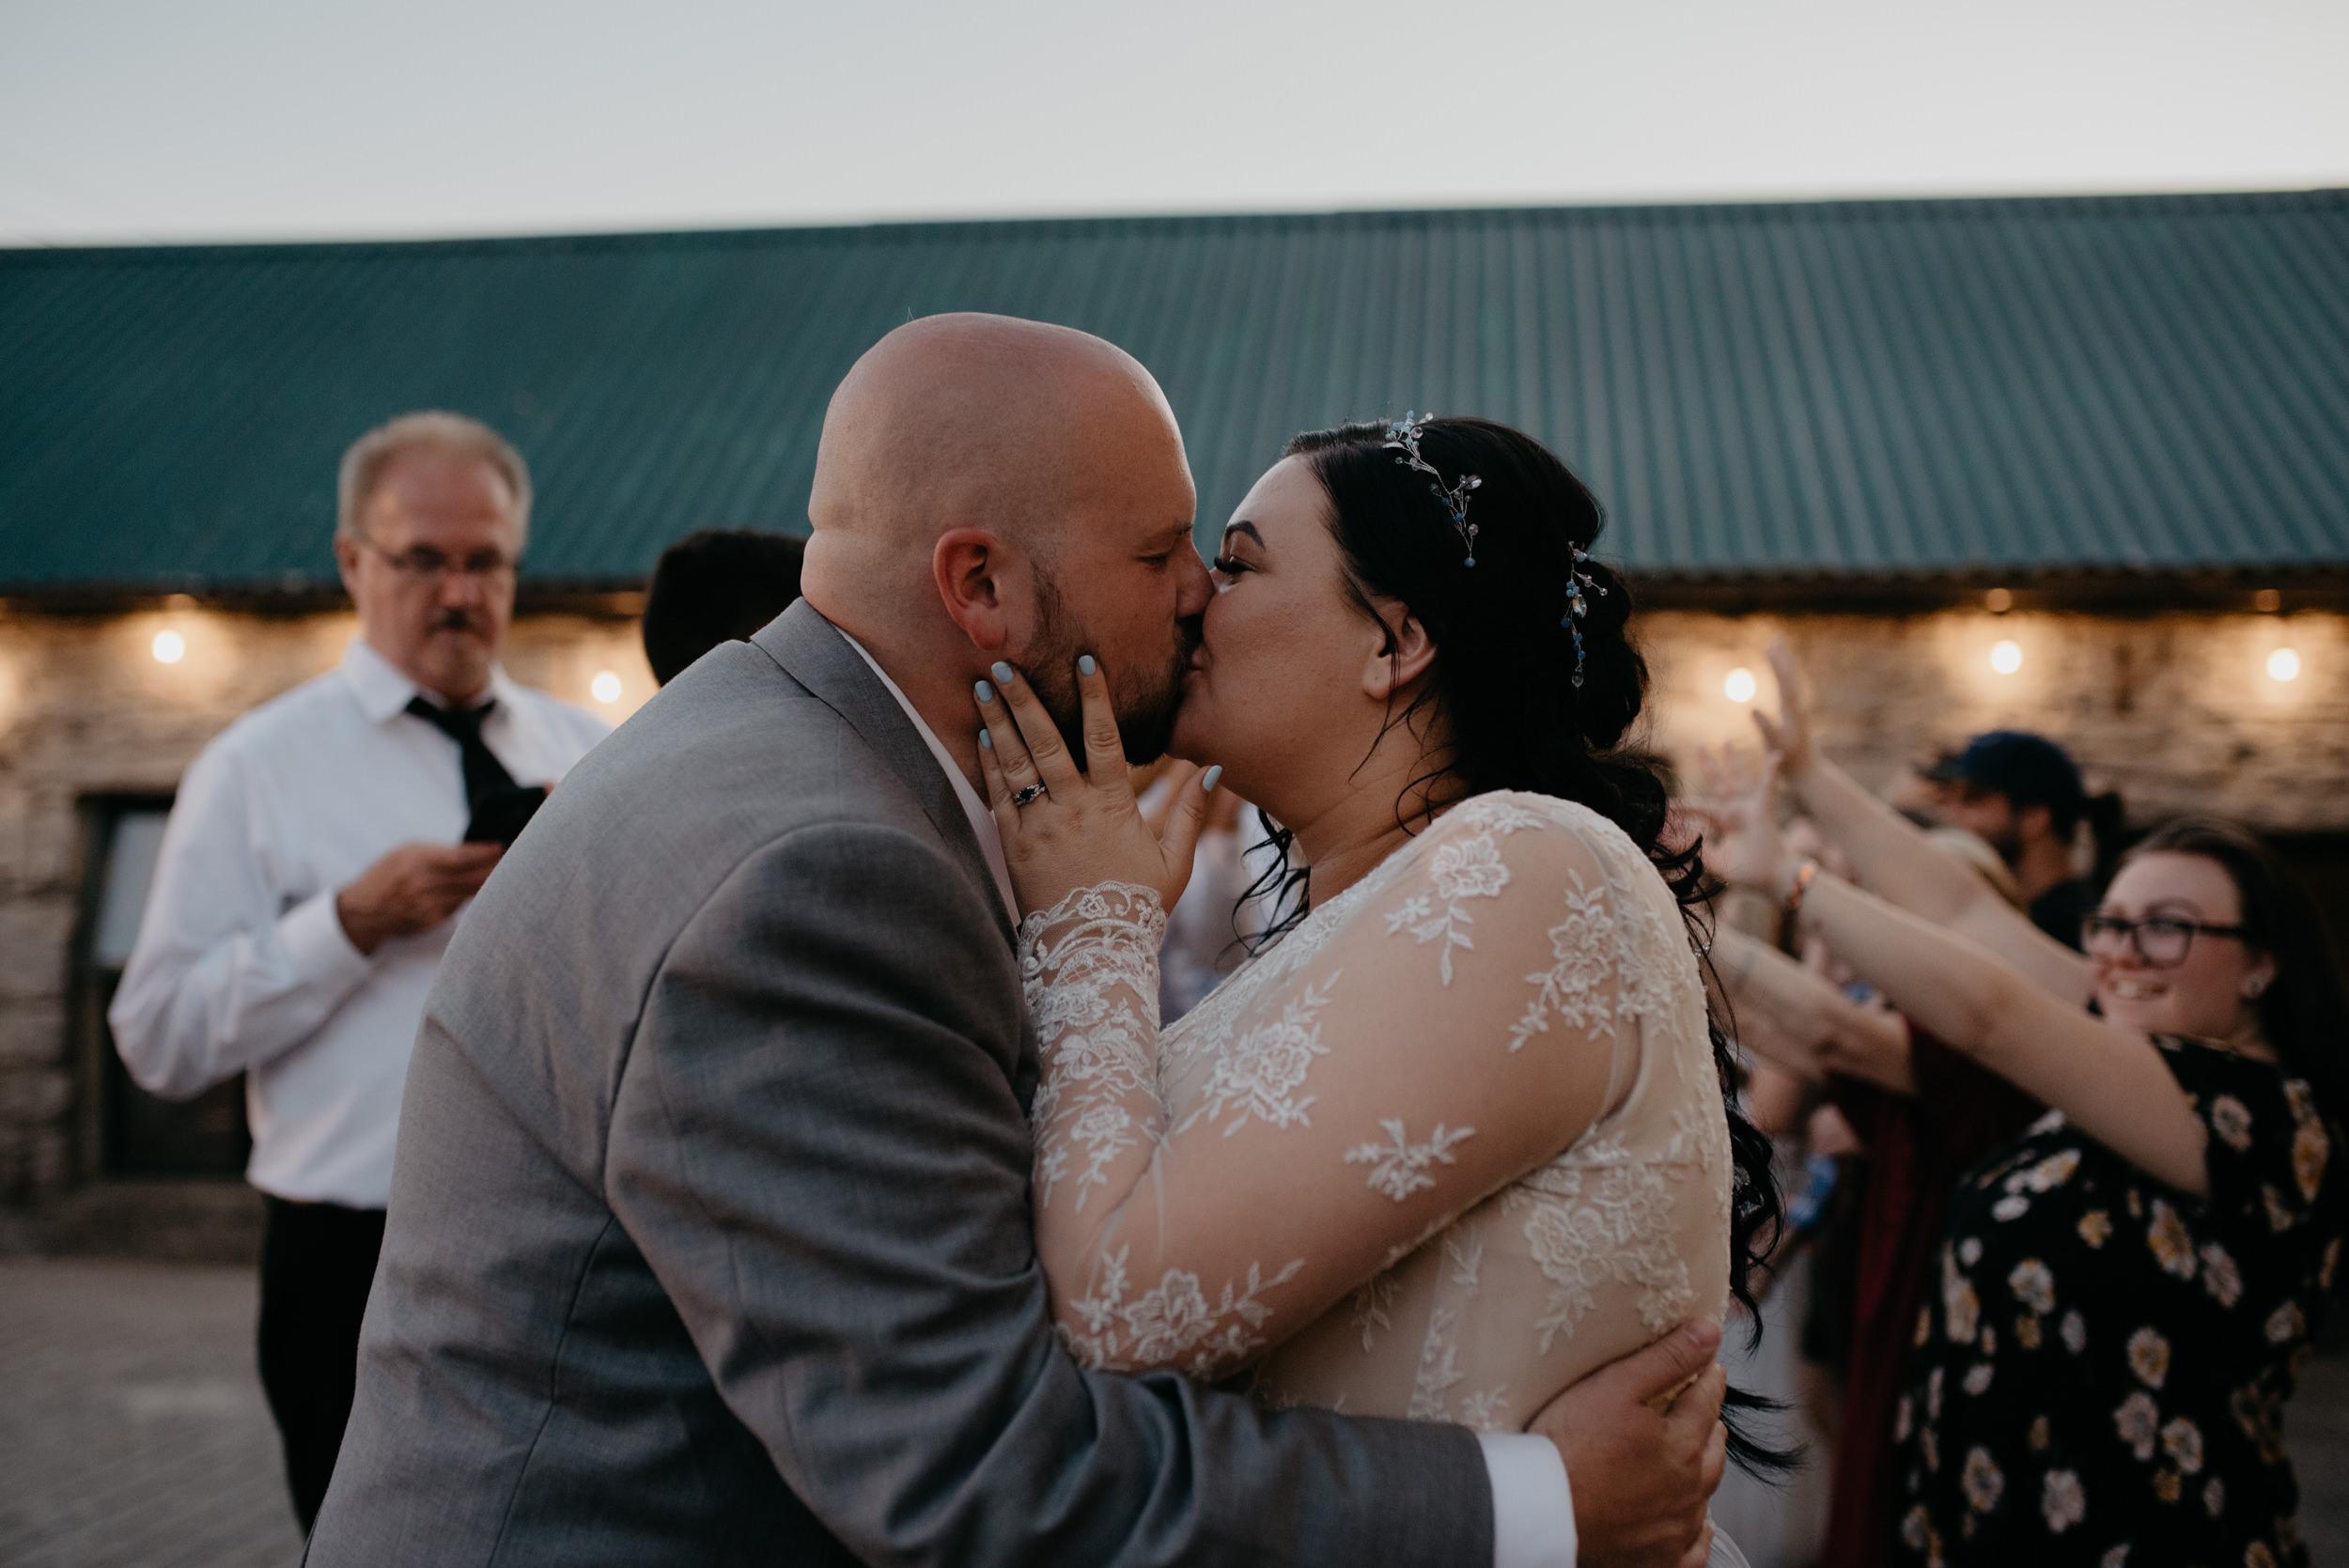 Ireland destination wedding and elopement photographer. Destination wedding in County Clare, Ireland. Reception at Vaughan's Pub in Kilfenora.